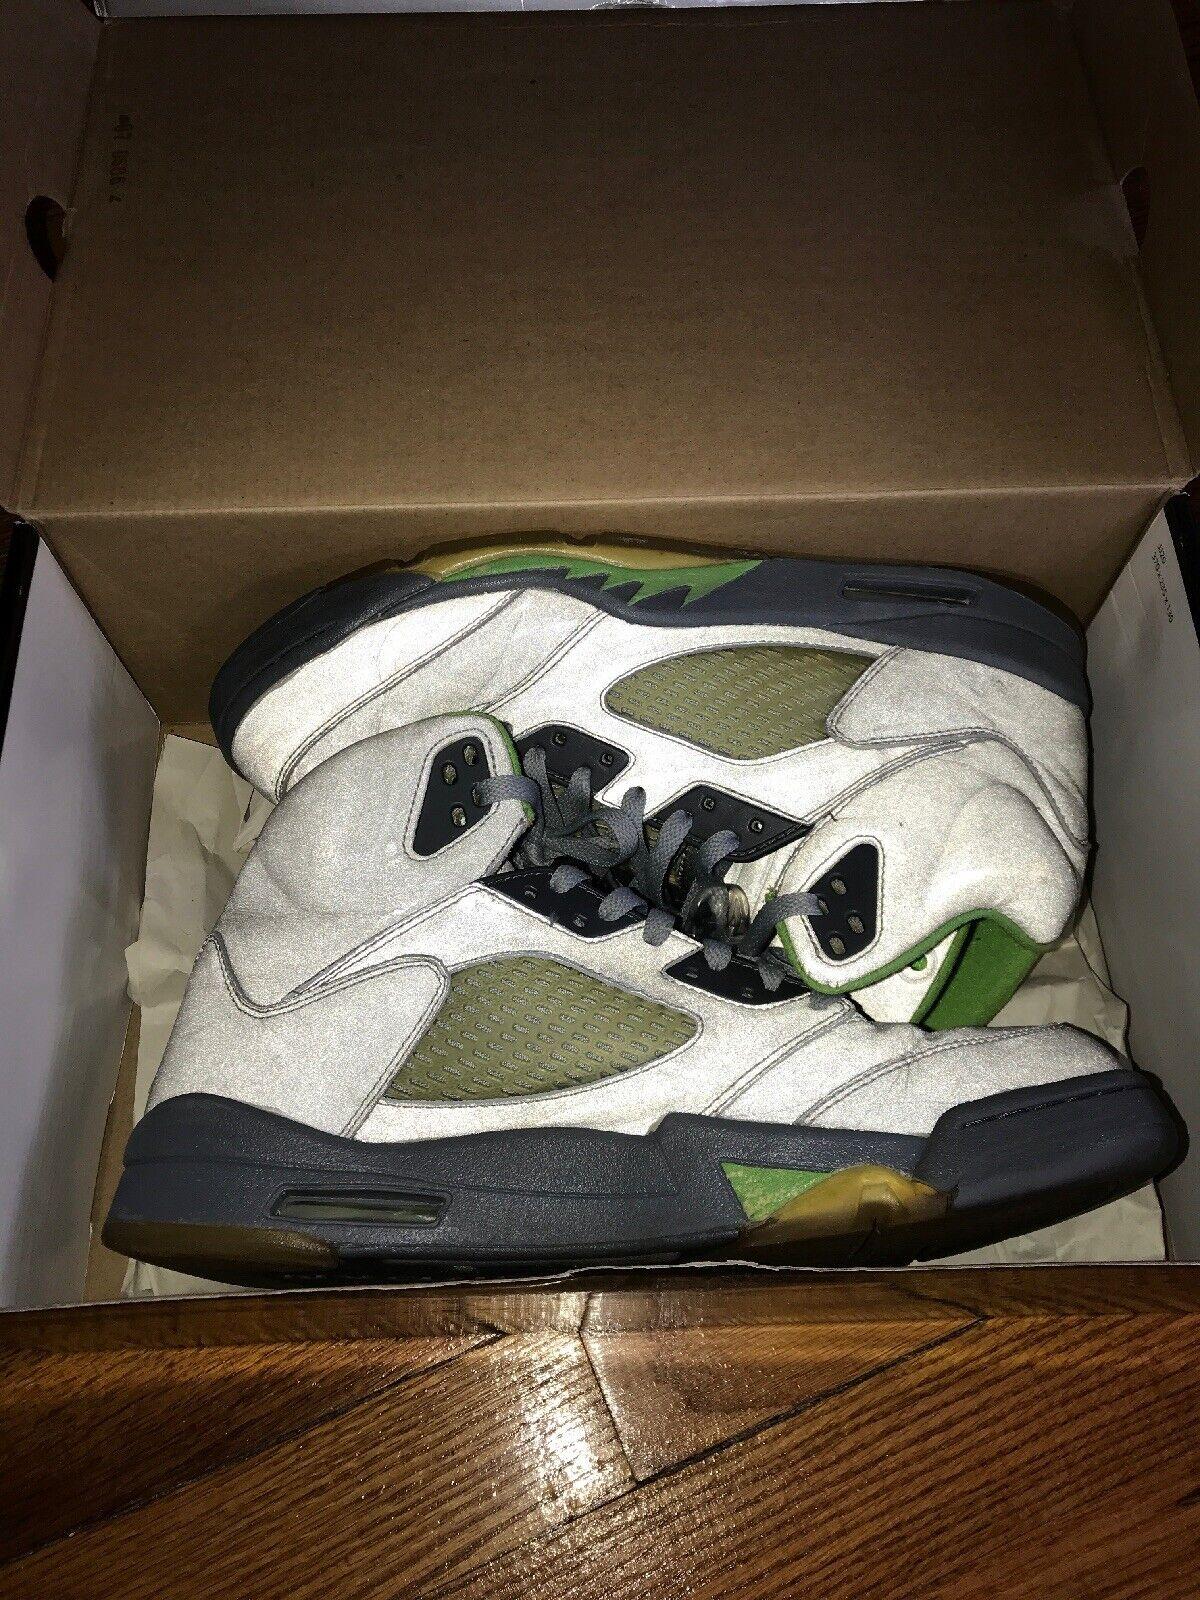 Nike Air Jordan 5 V Green Bean Retro (2006) - sz 11.5